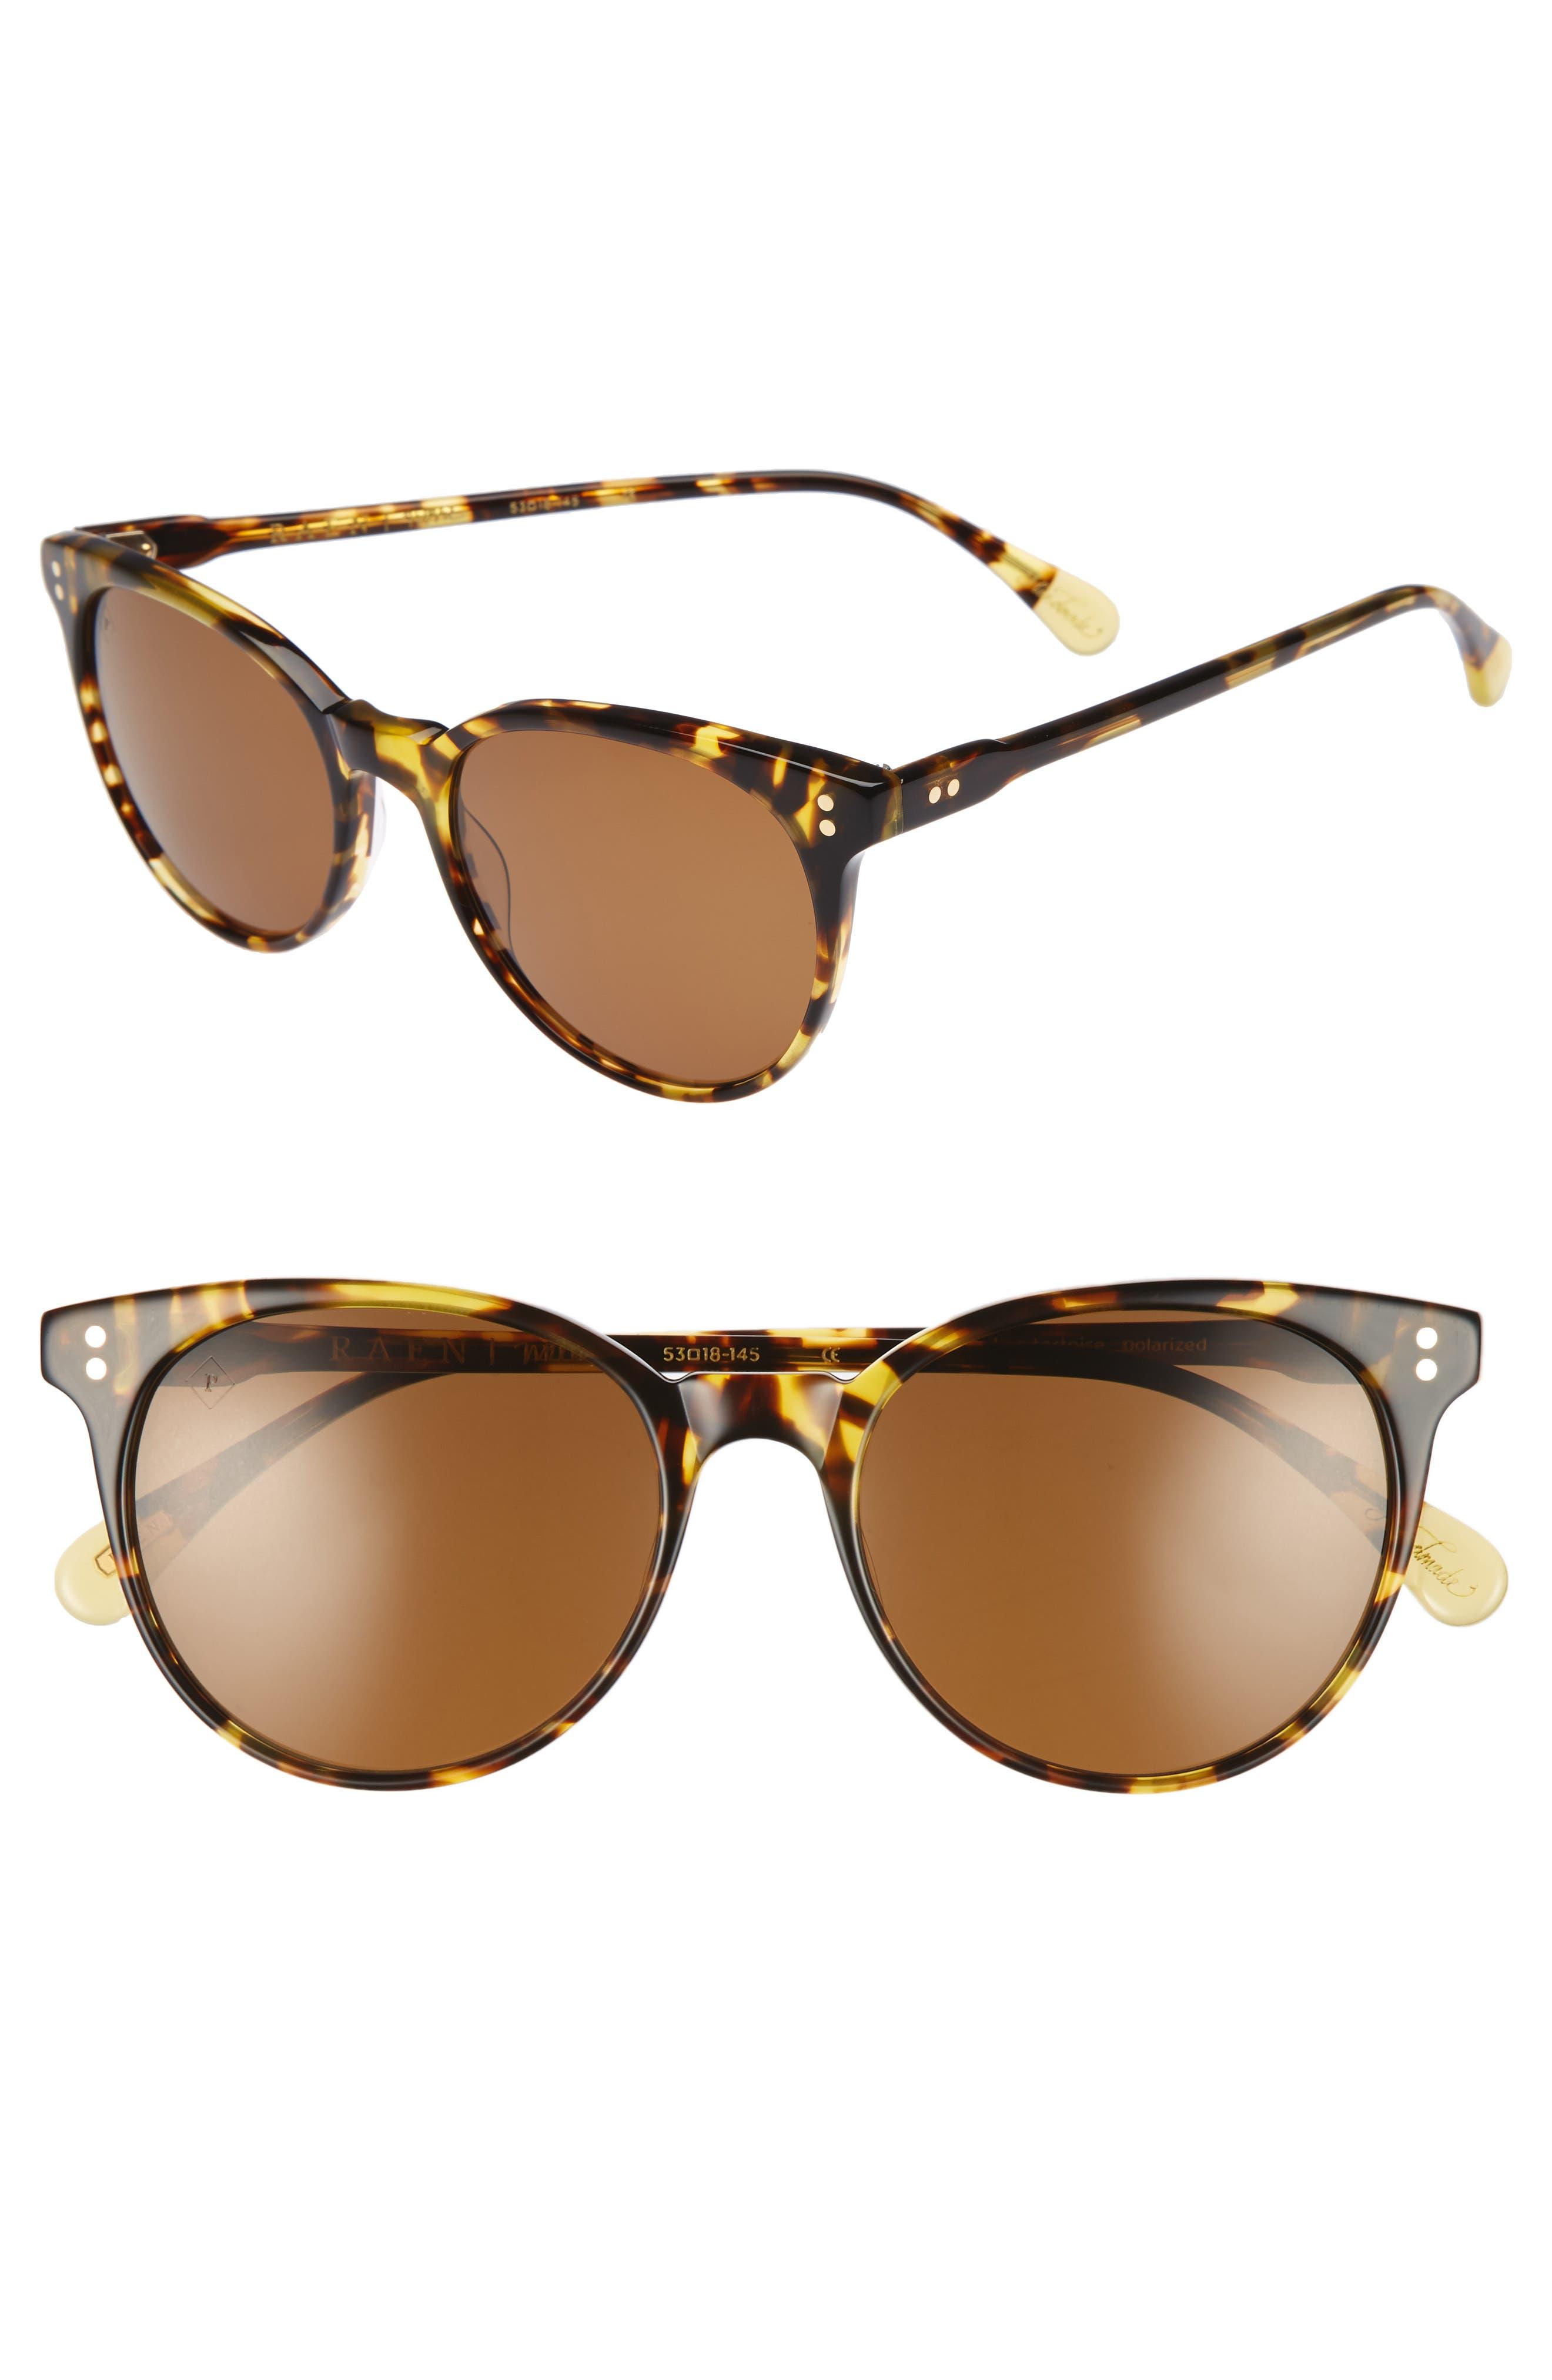 Norie 53mm Sunglasses,                         Main,                         color, Tokyo Tortoise/ Brown